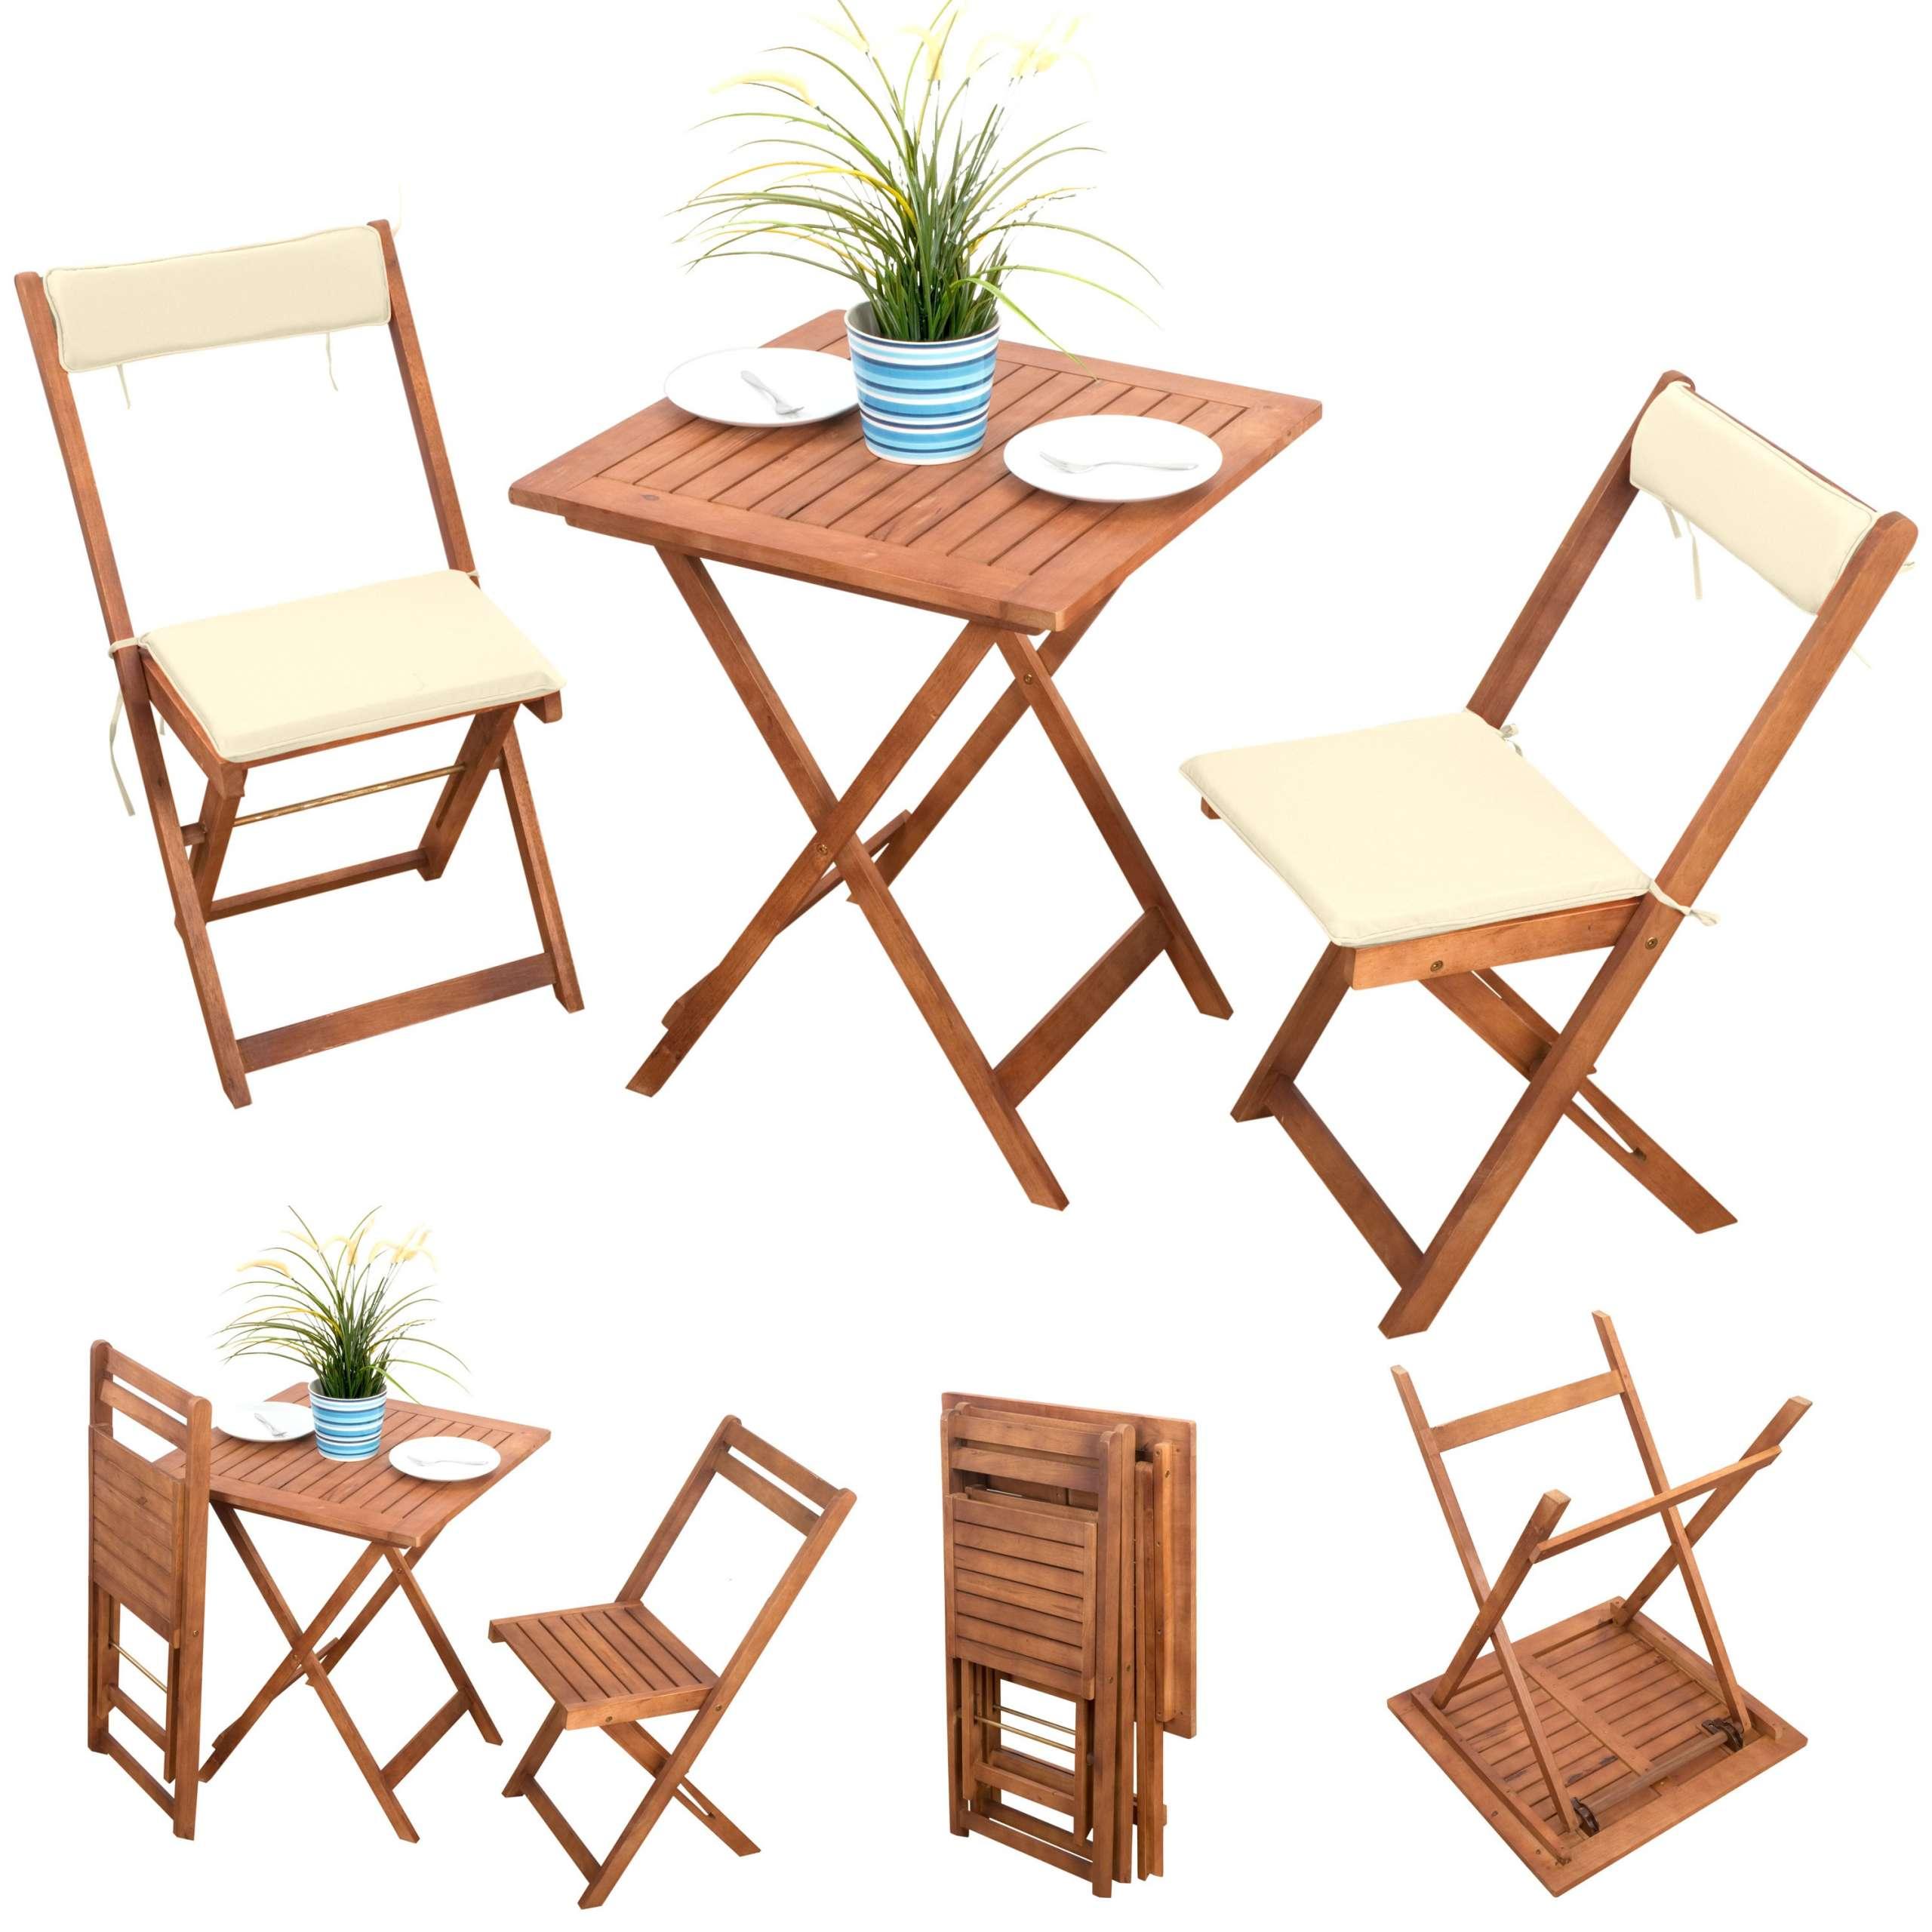 Holz Gartenmöbel Set ▻ günstig ◅ Gartenmöbel Holz Set kaufen